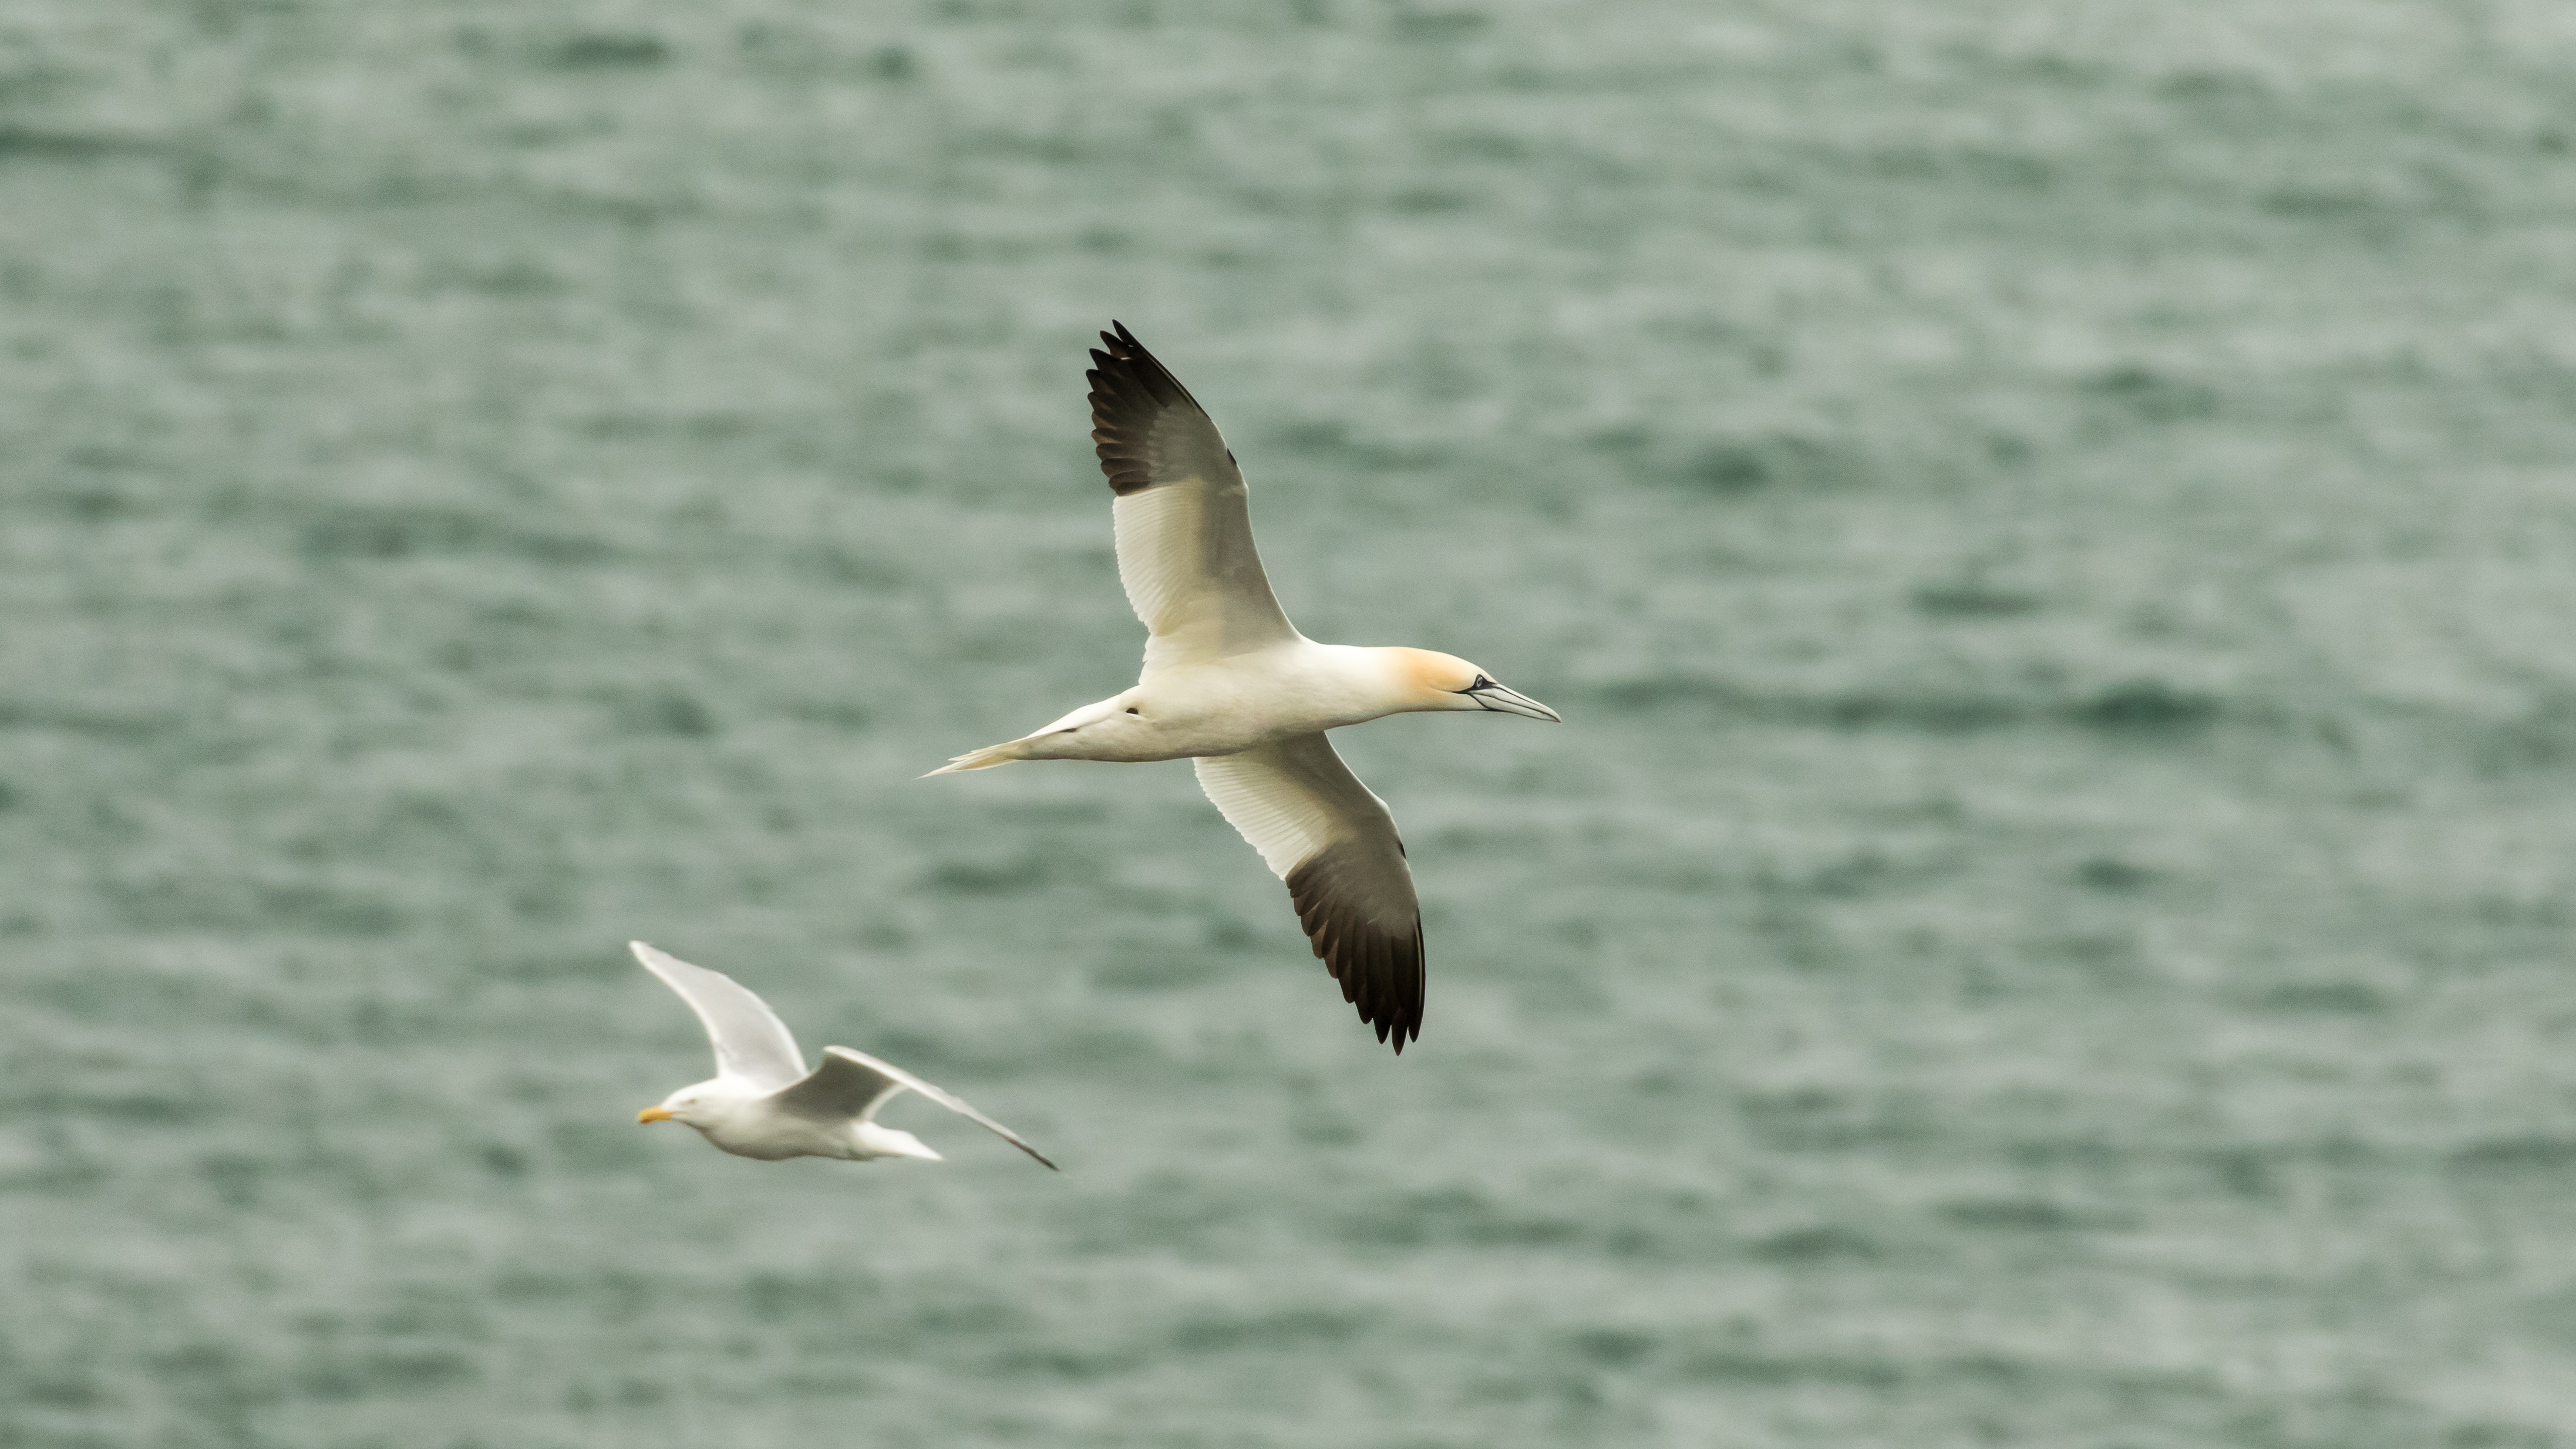 Gannet and gull in flight